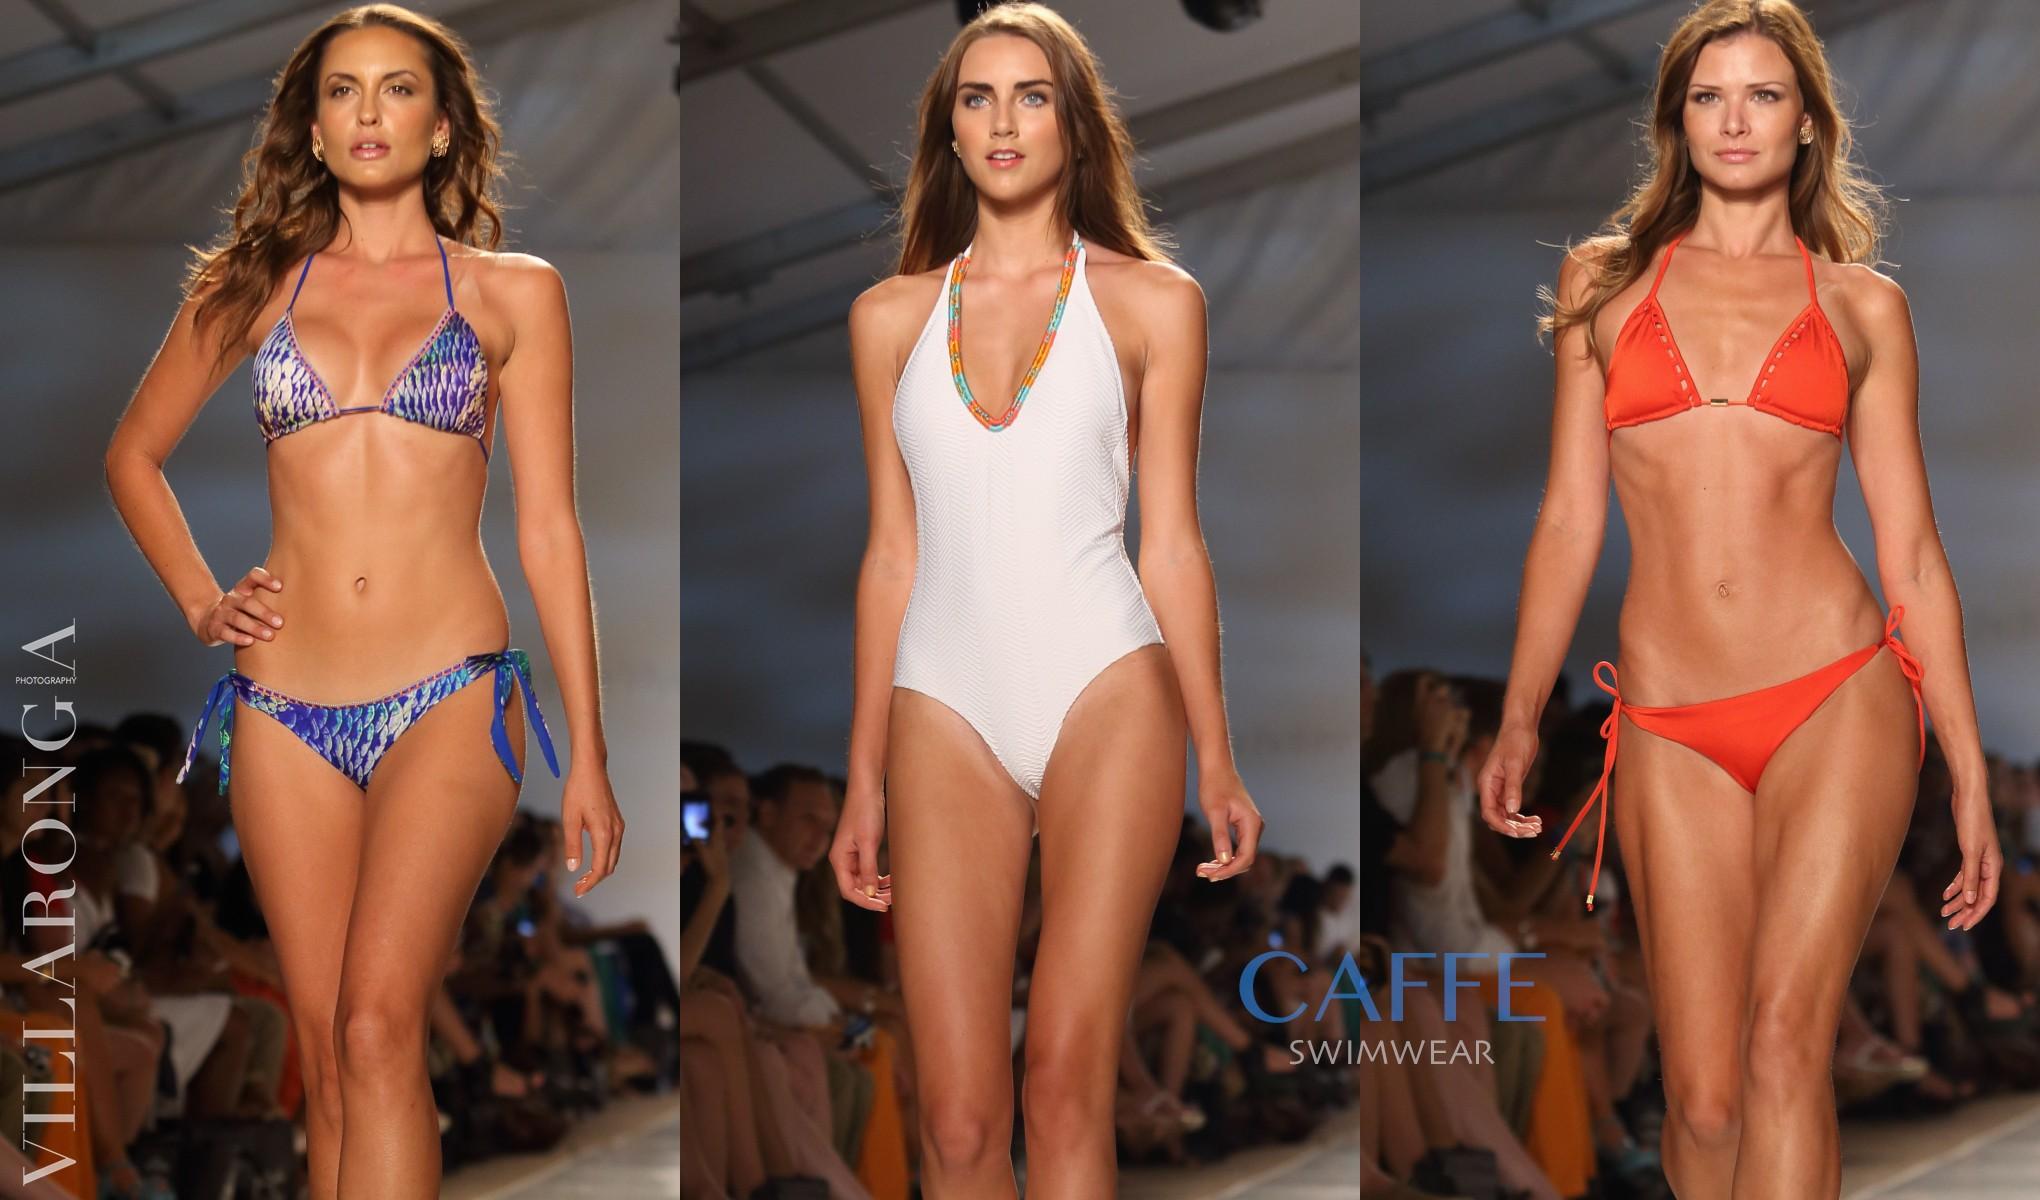 Johnny Villaronga Miami Photographer Spotlight CAFFE Swimwear